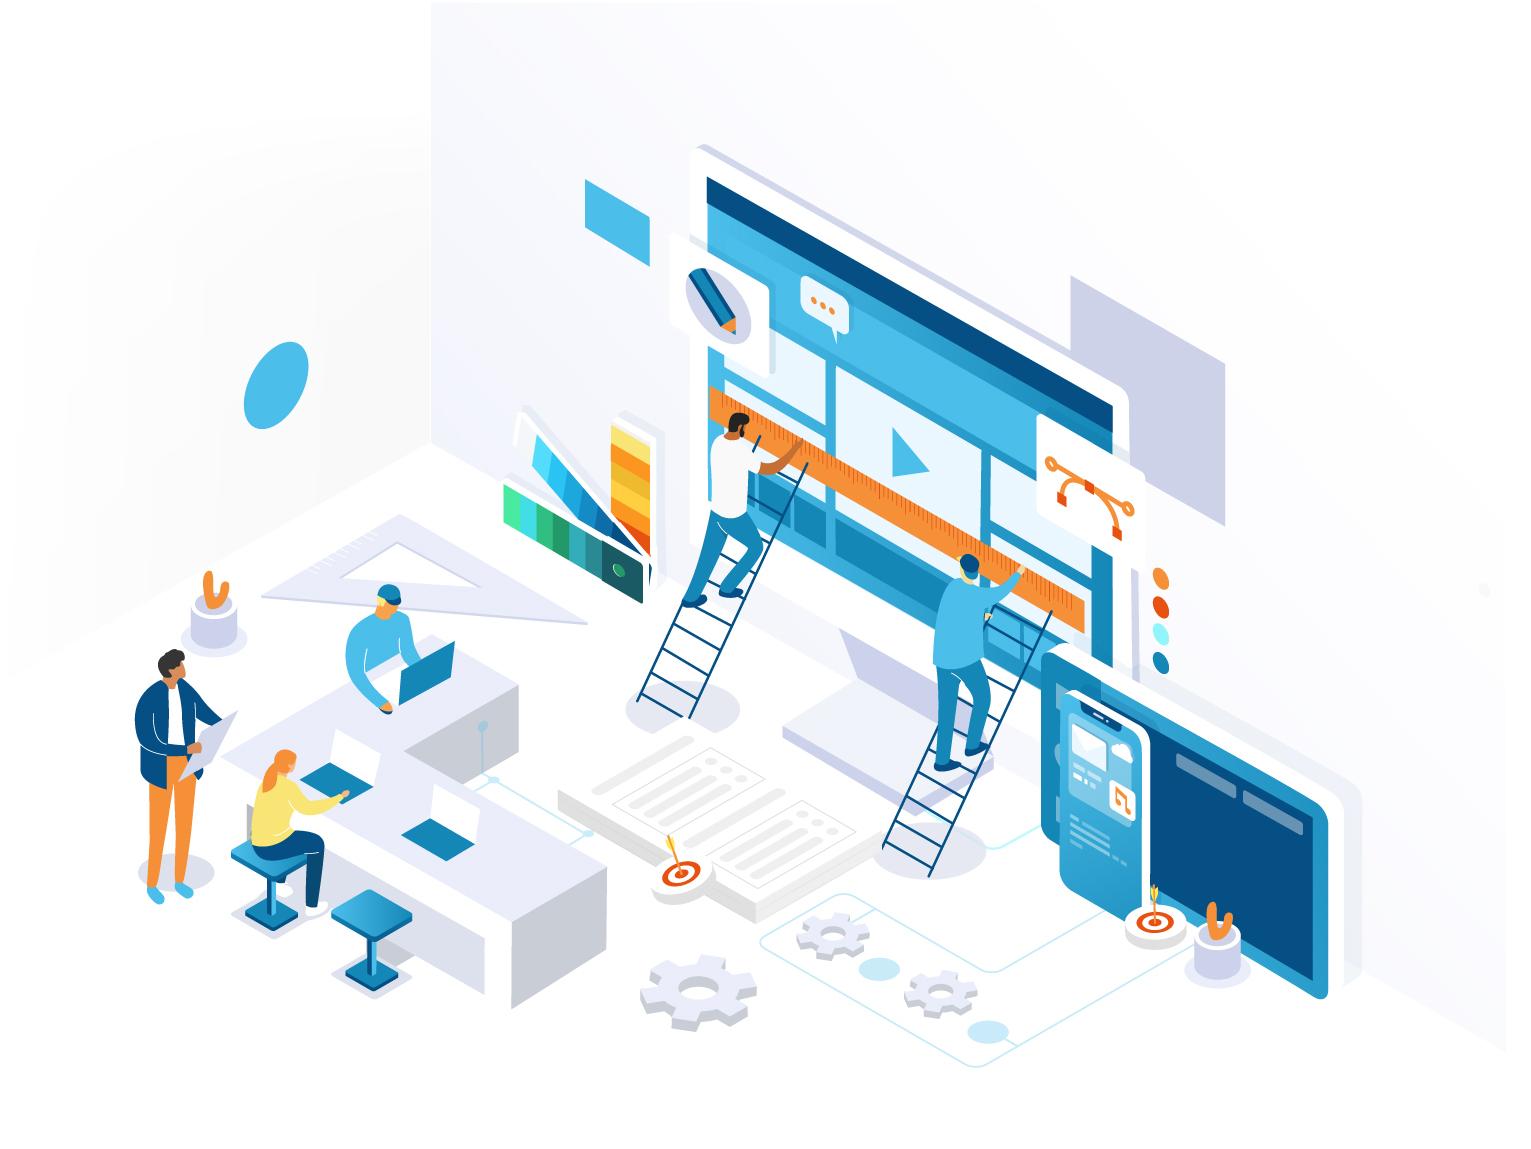 Designer Illustration interface app 3d ui development agency page landing website isometric illustration